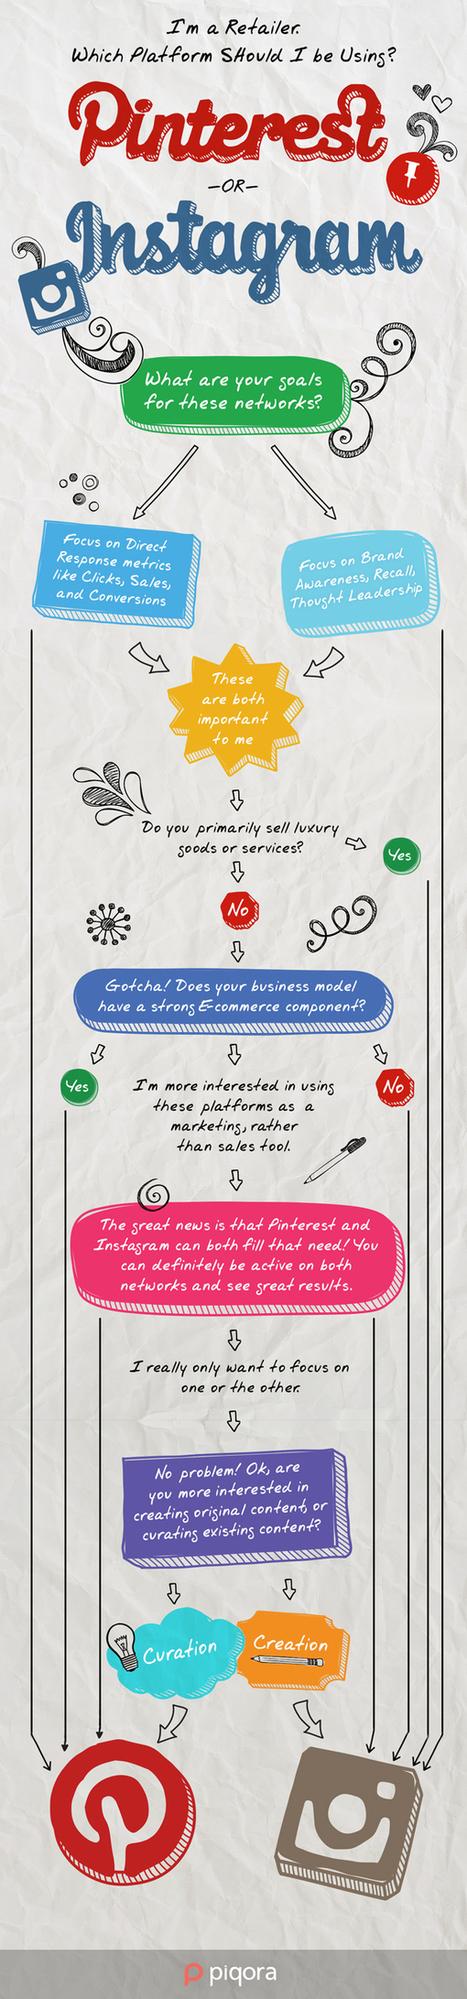 Marketing para retailers en: ¿Pinterest o Instagram? #infogrfia #infographic #socialmedia | Seo, Social Media Marketing | Scoop.it